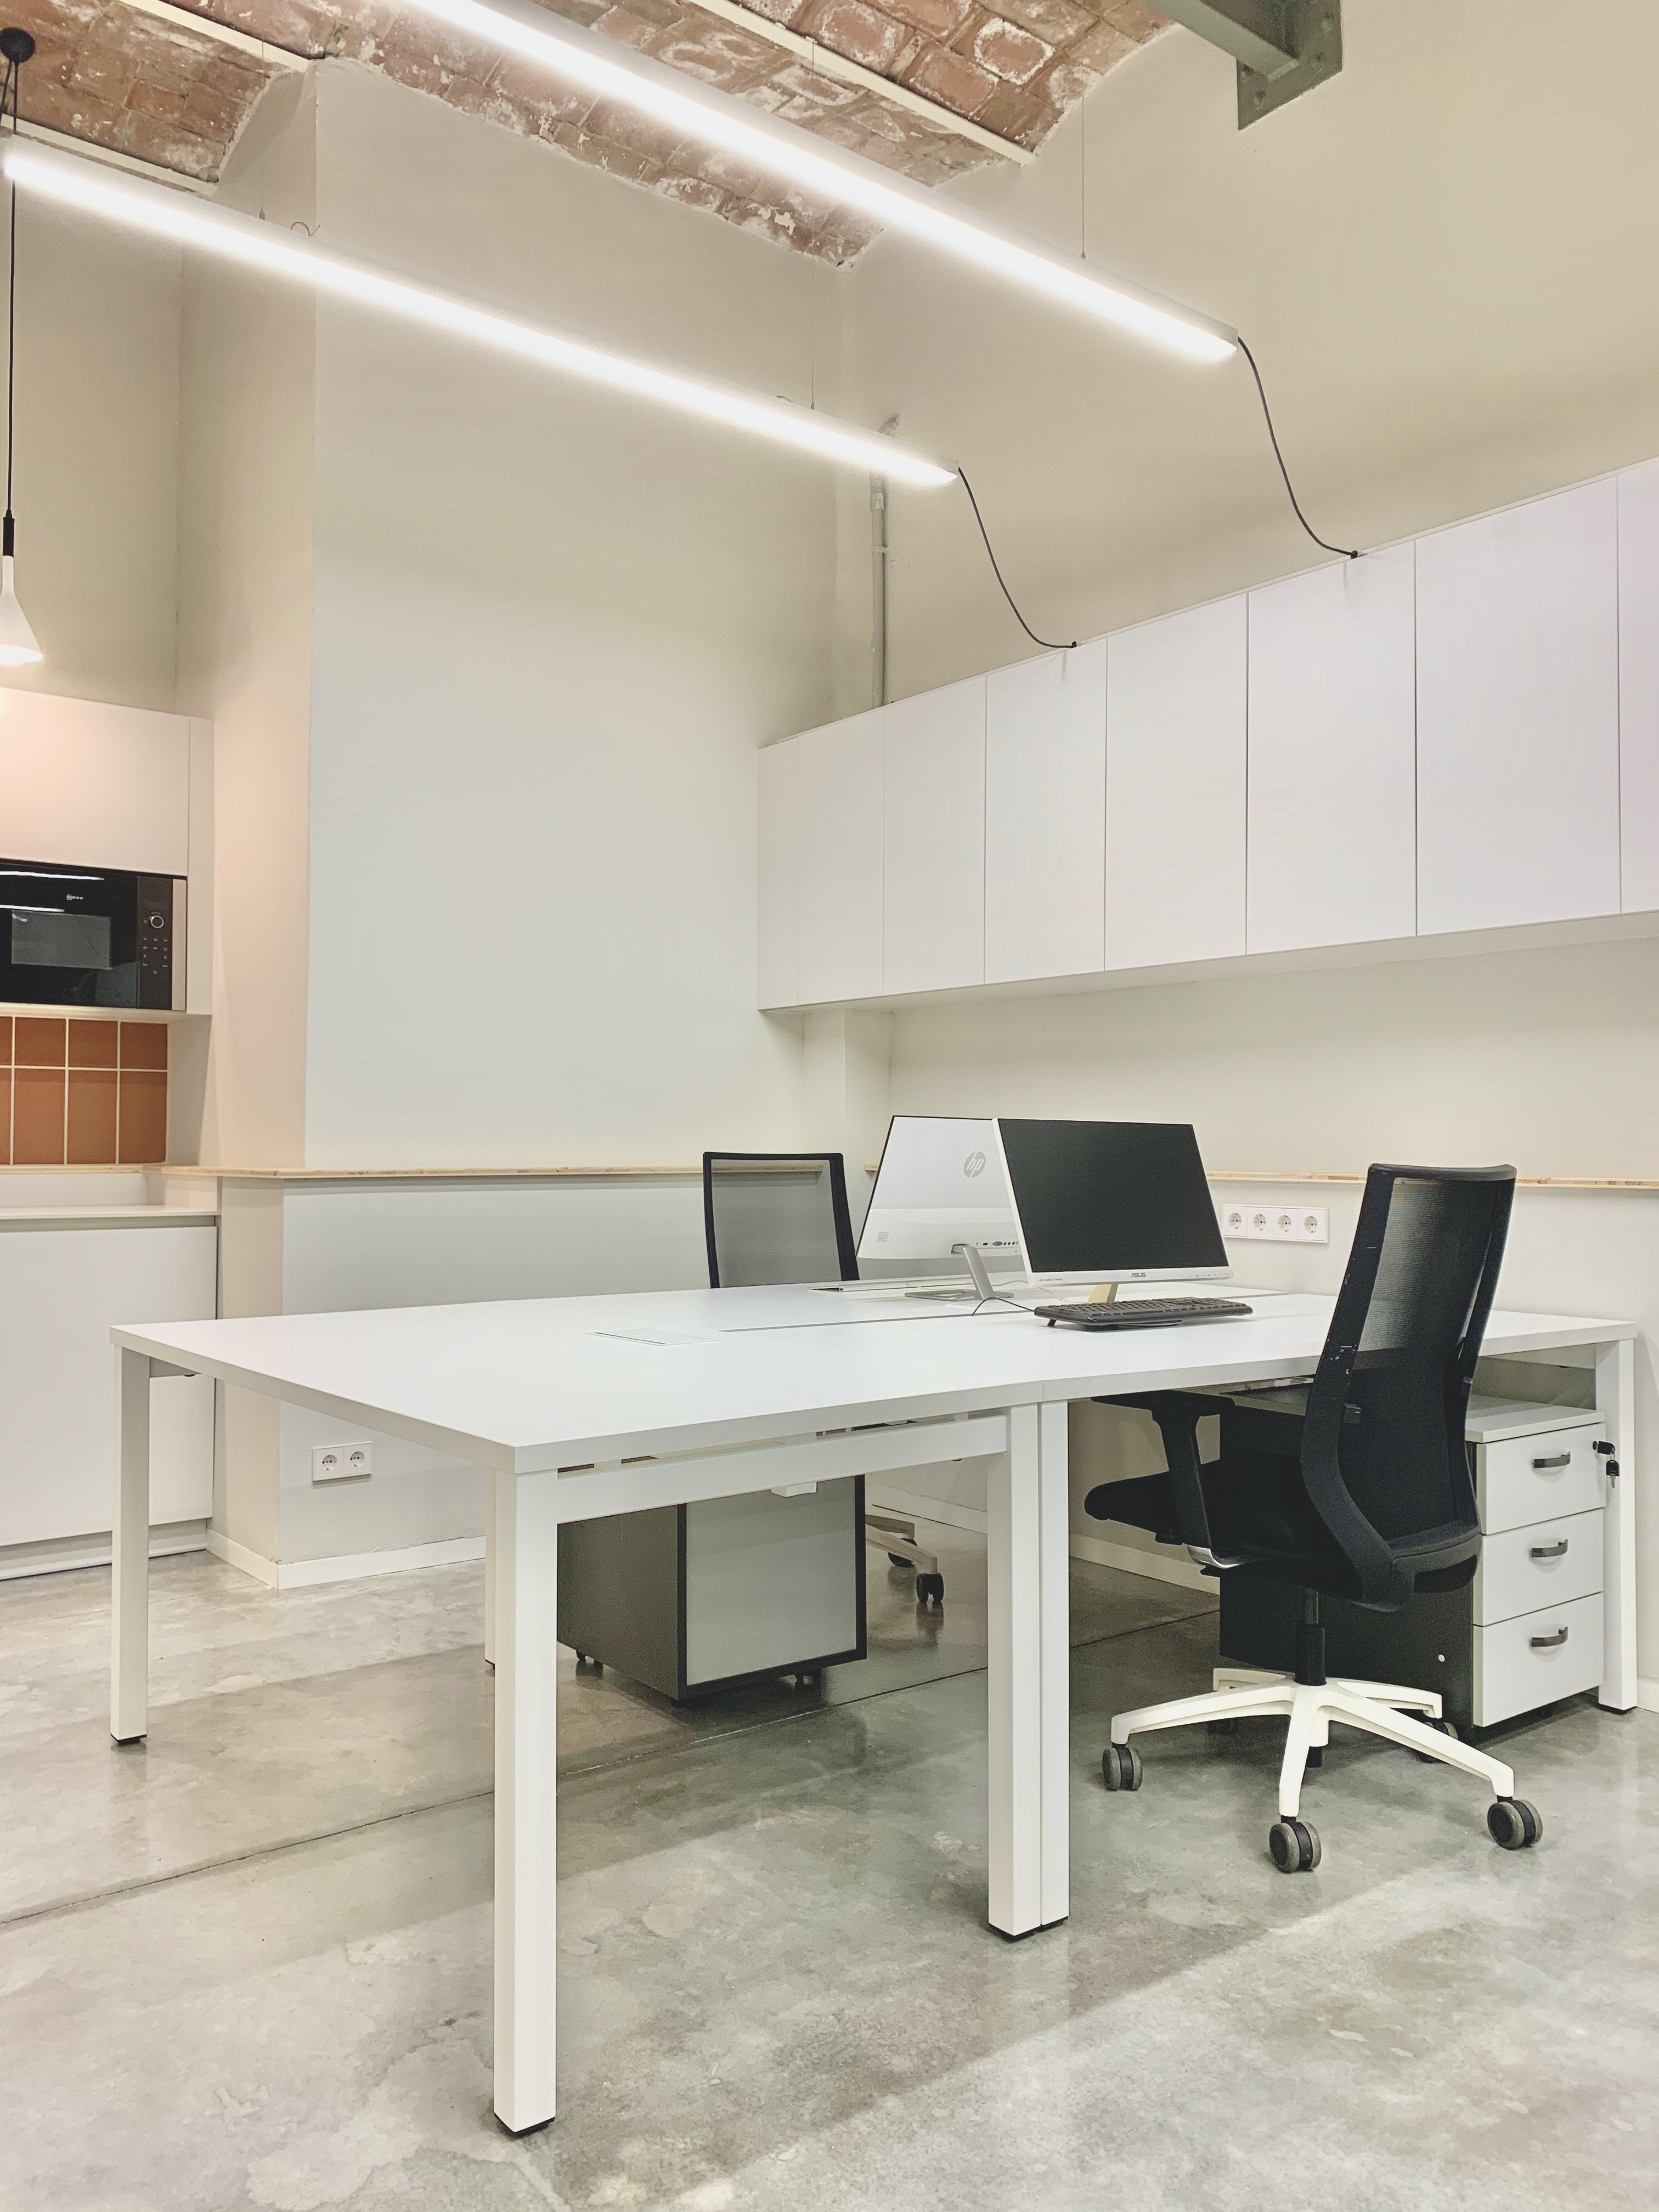 Arquivistes office 4